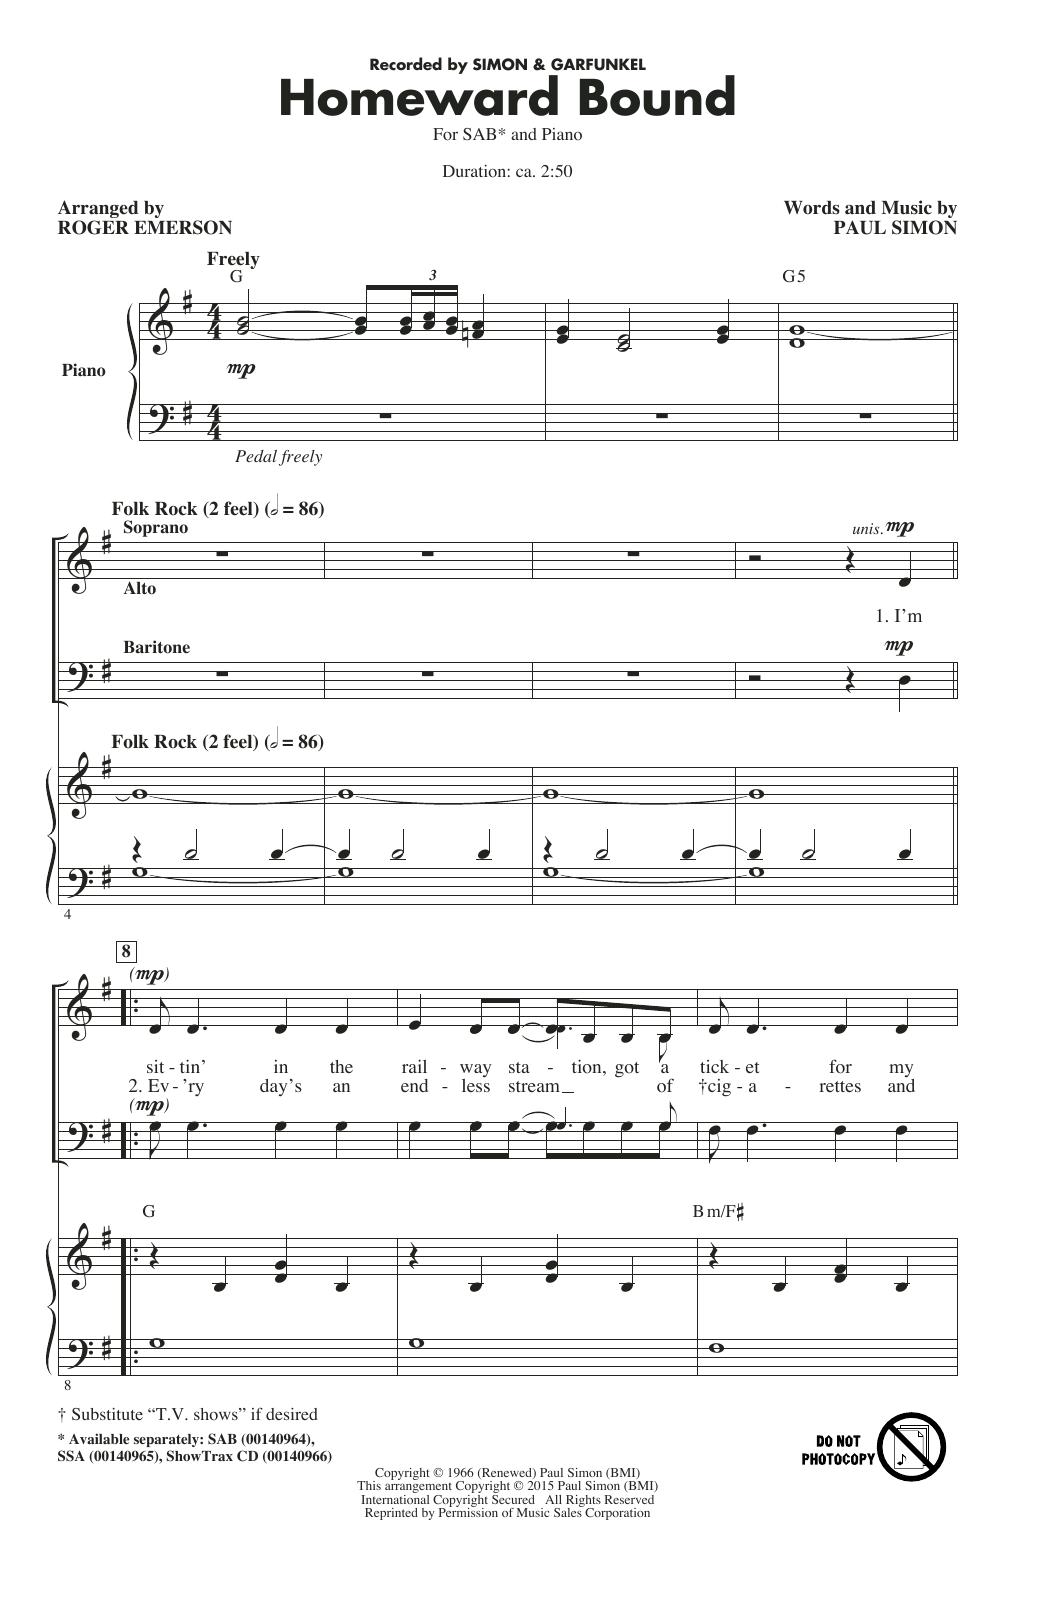 Homeward Bound (arr. Roger Emerson) Sheet Music